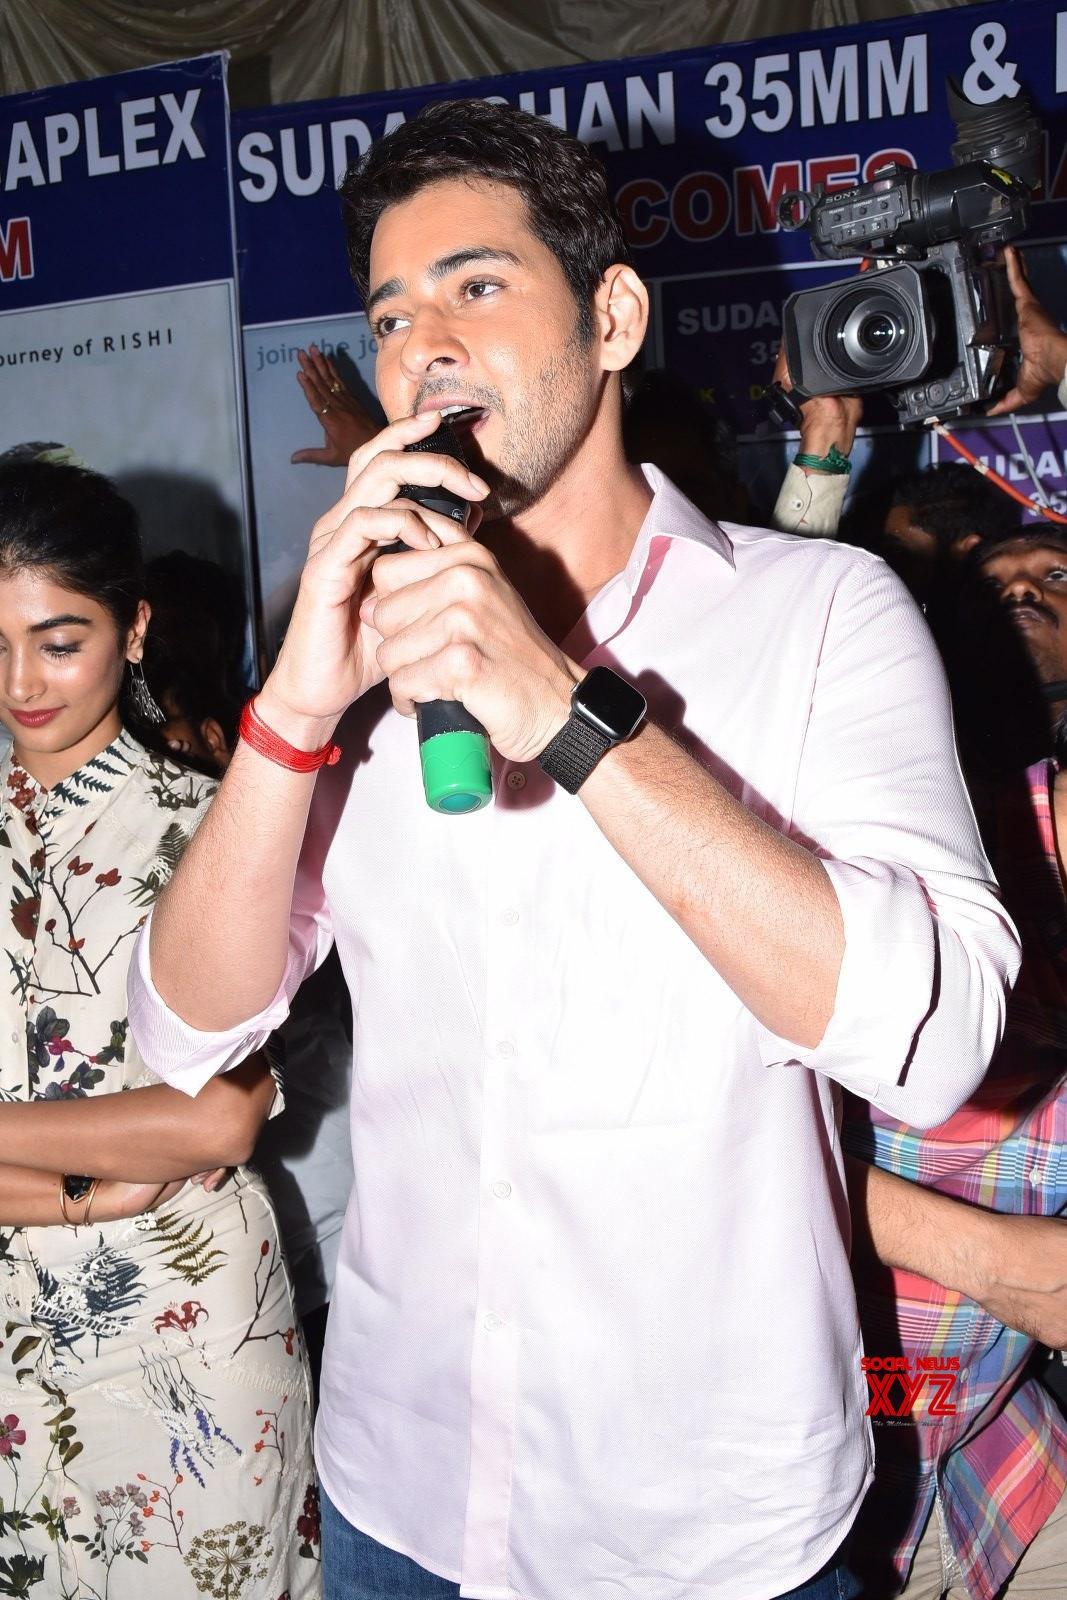 Mahesh Babu Visits To Sudarshan 35 MM With Maharshi Movie Team Gallery Set 4